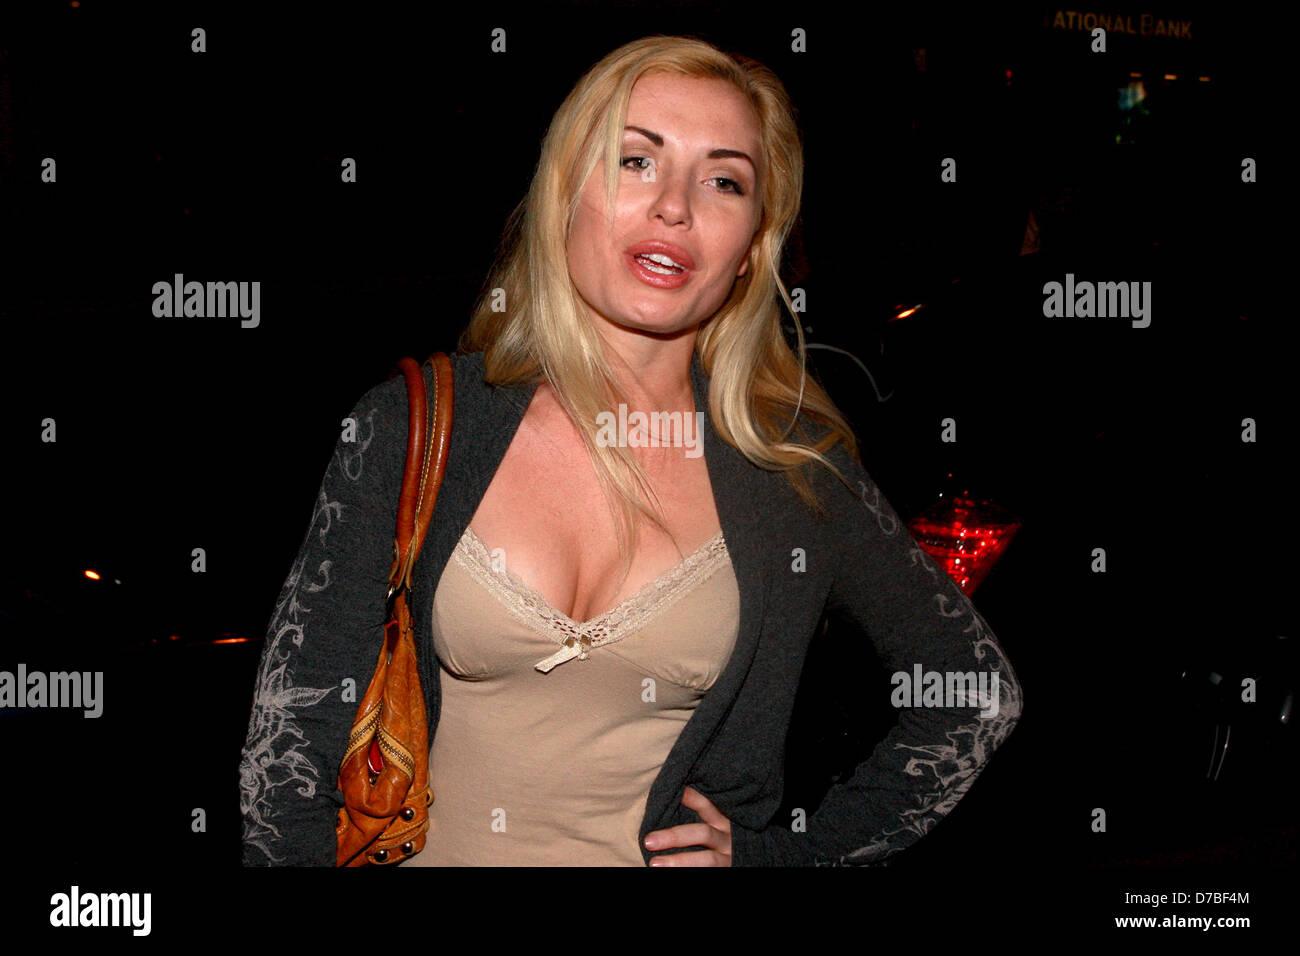 Lindsay Crolius Nude Photos 59